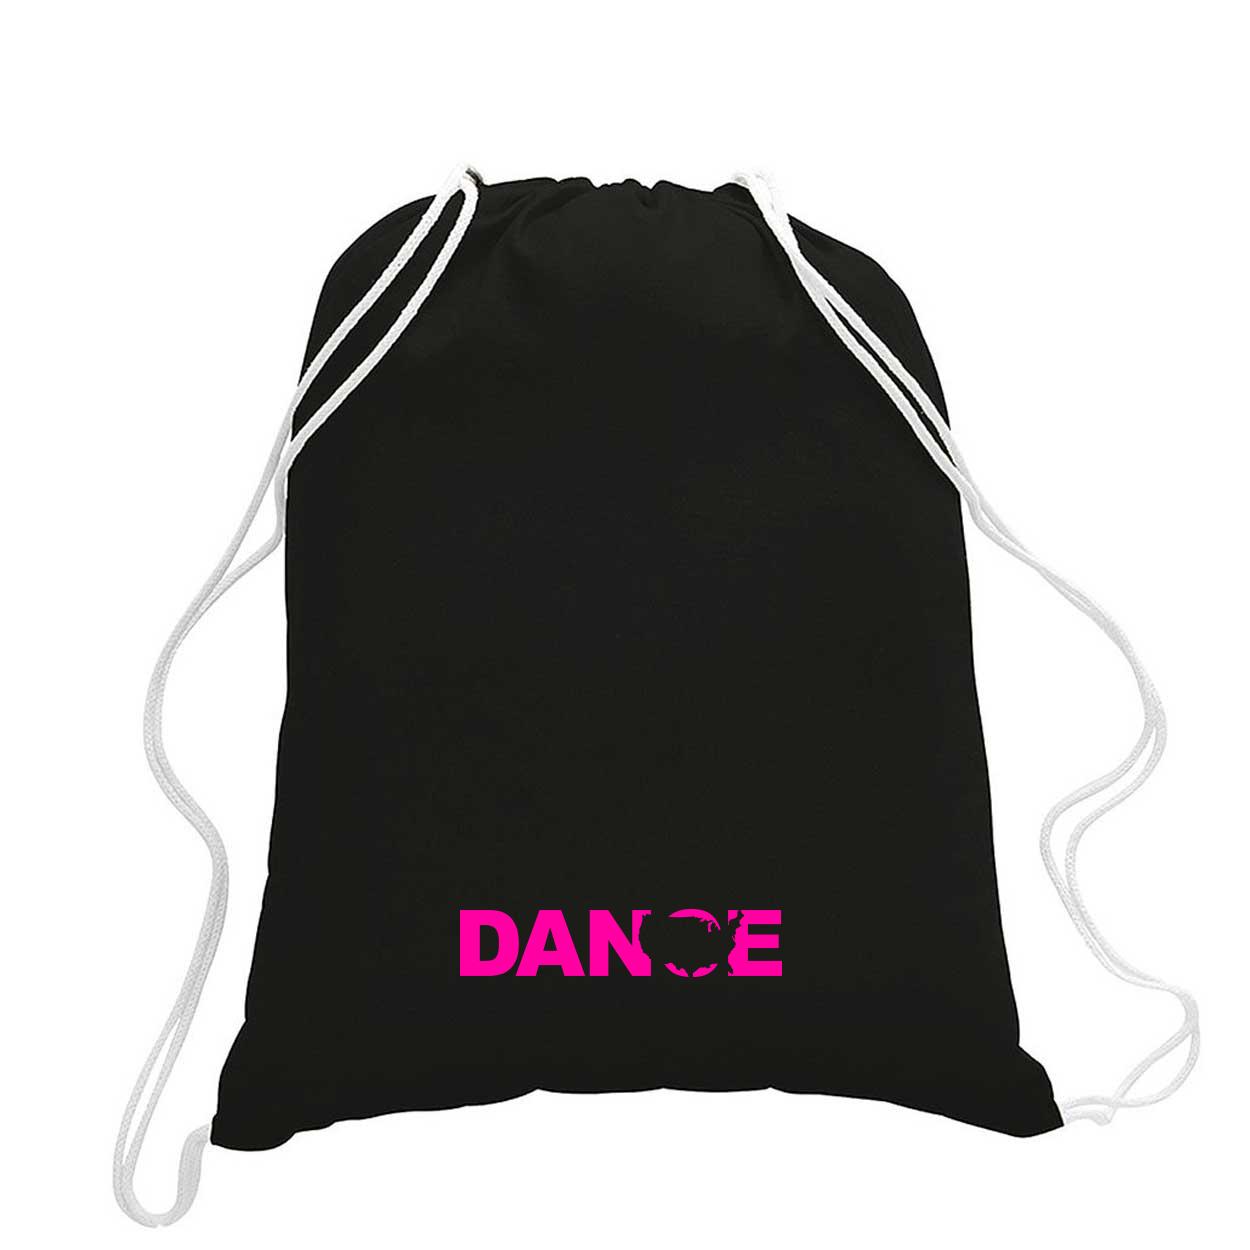 Dance United States Classic Drawstring Sport Pack Bag/Cinch Sack Black (Pink Logo)